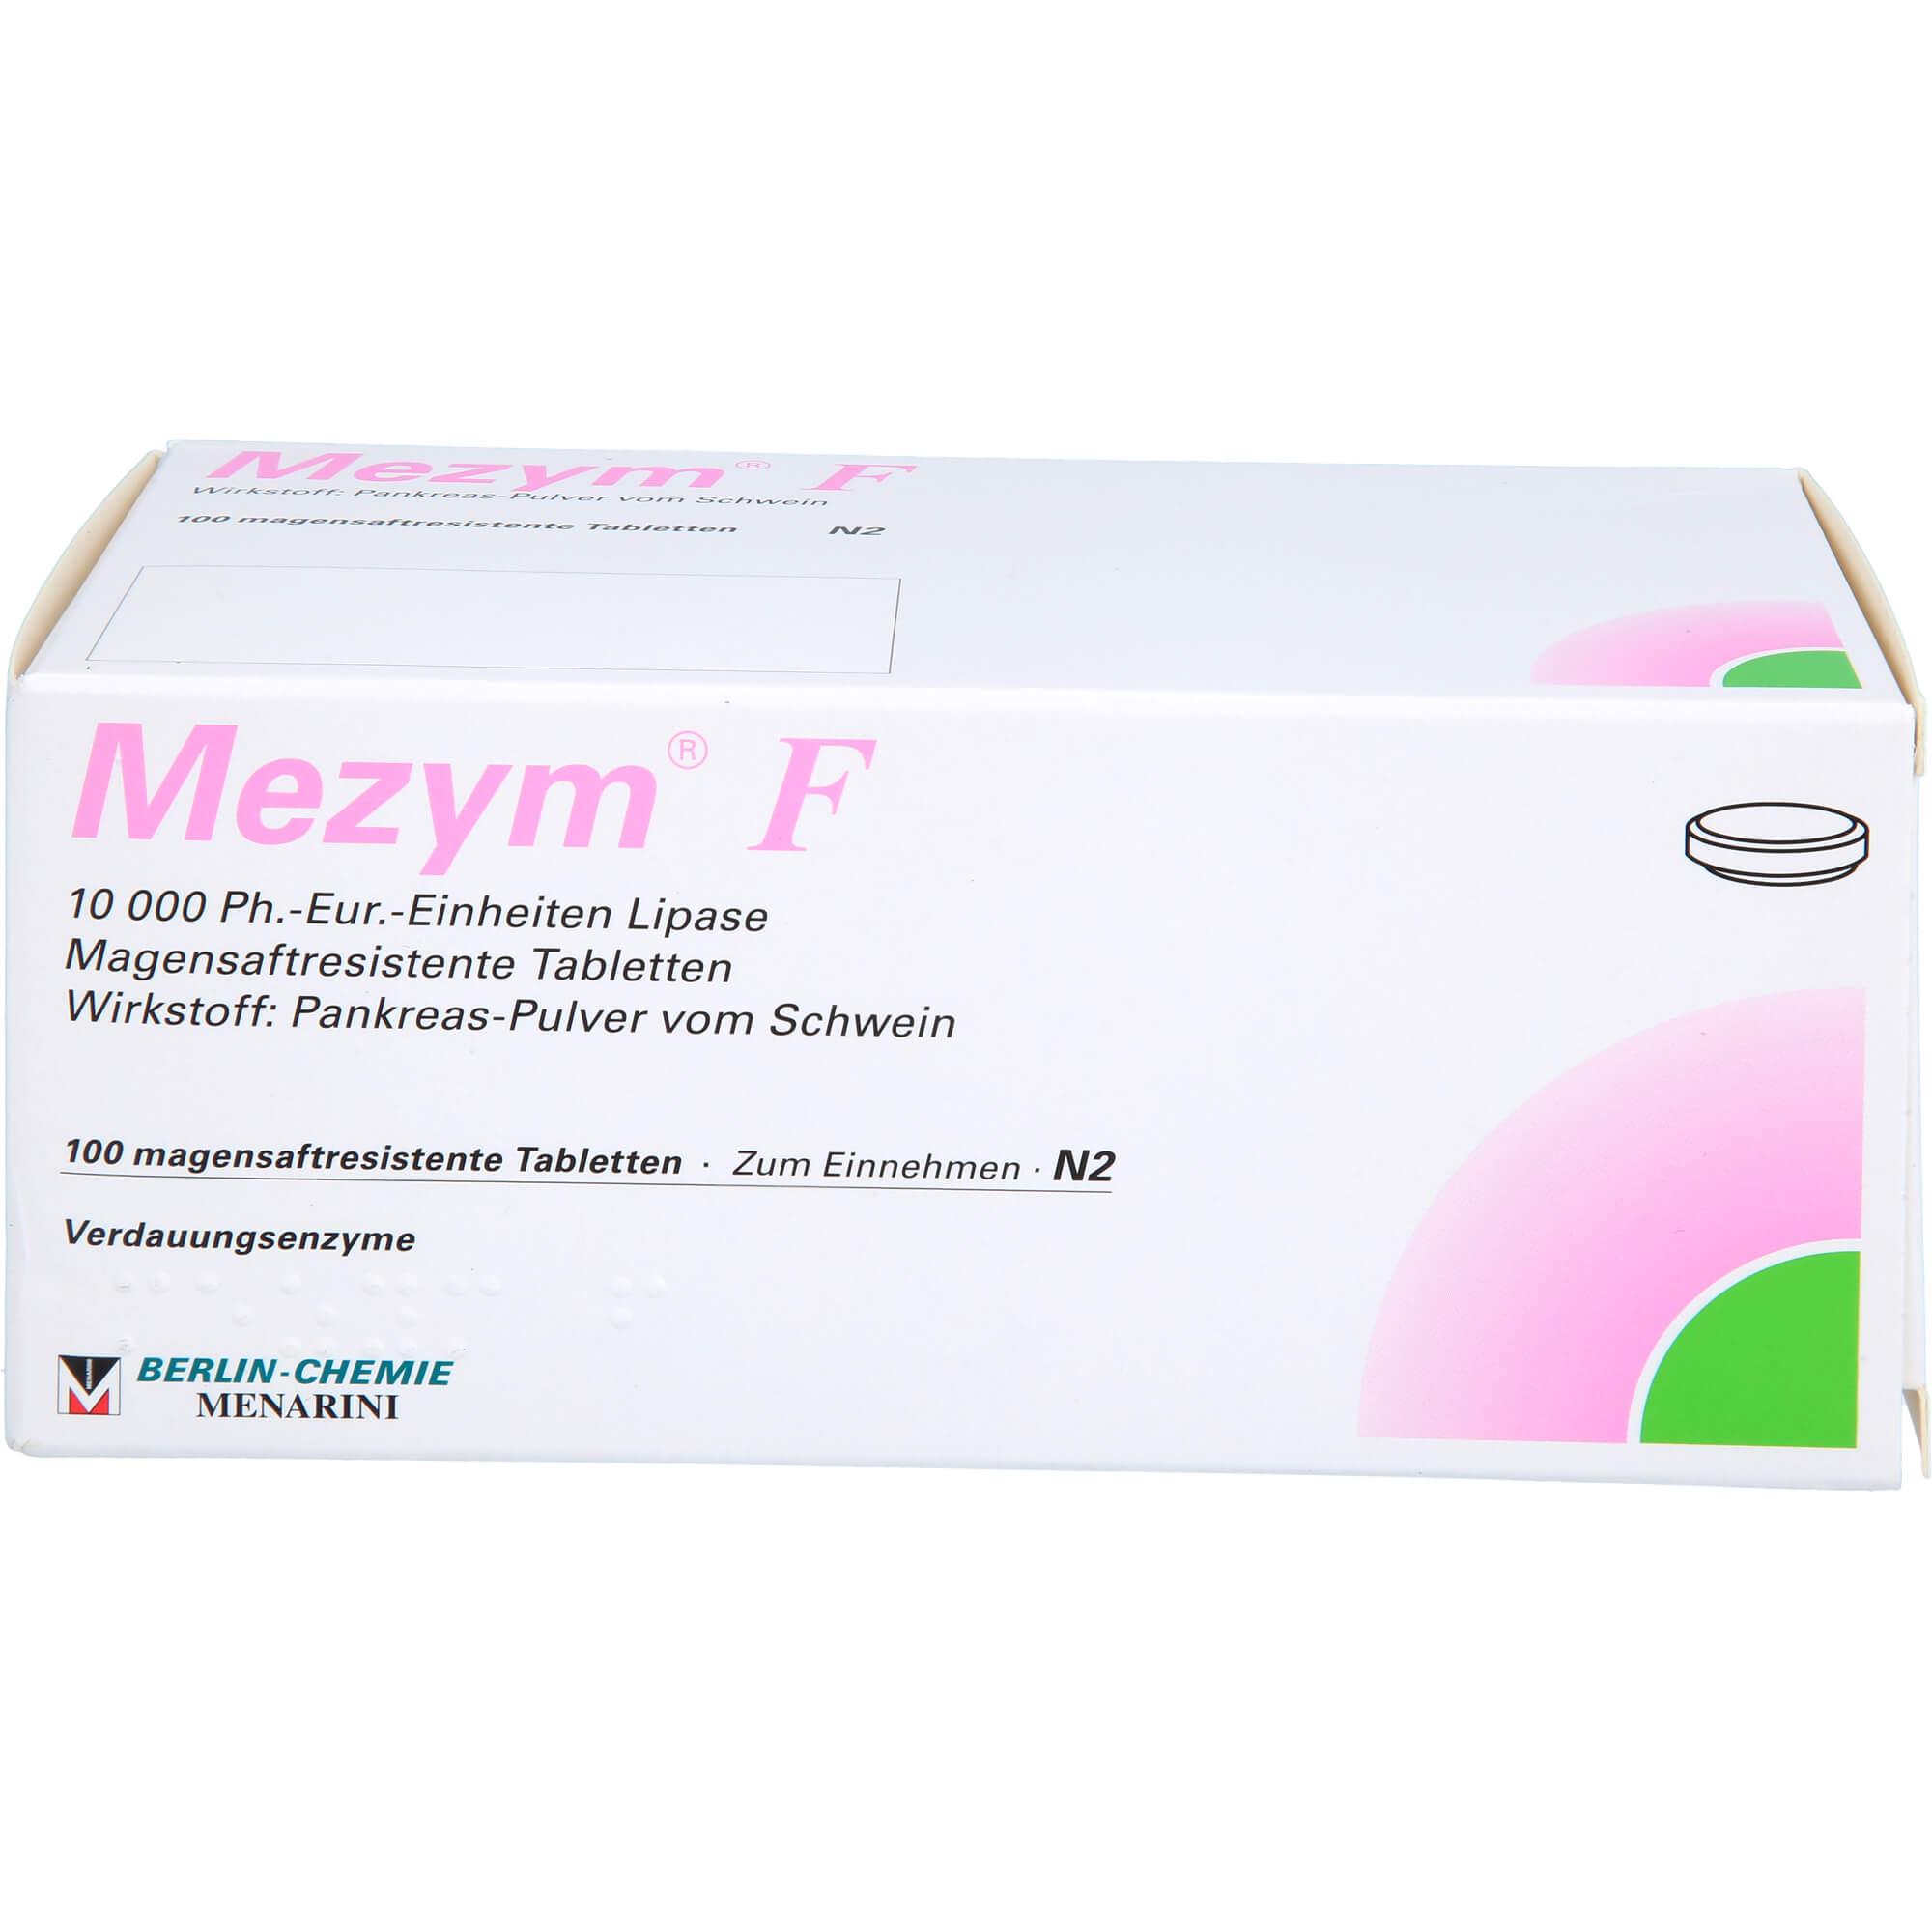 MEZYM F magensaftresistente Tabletten